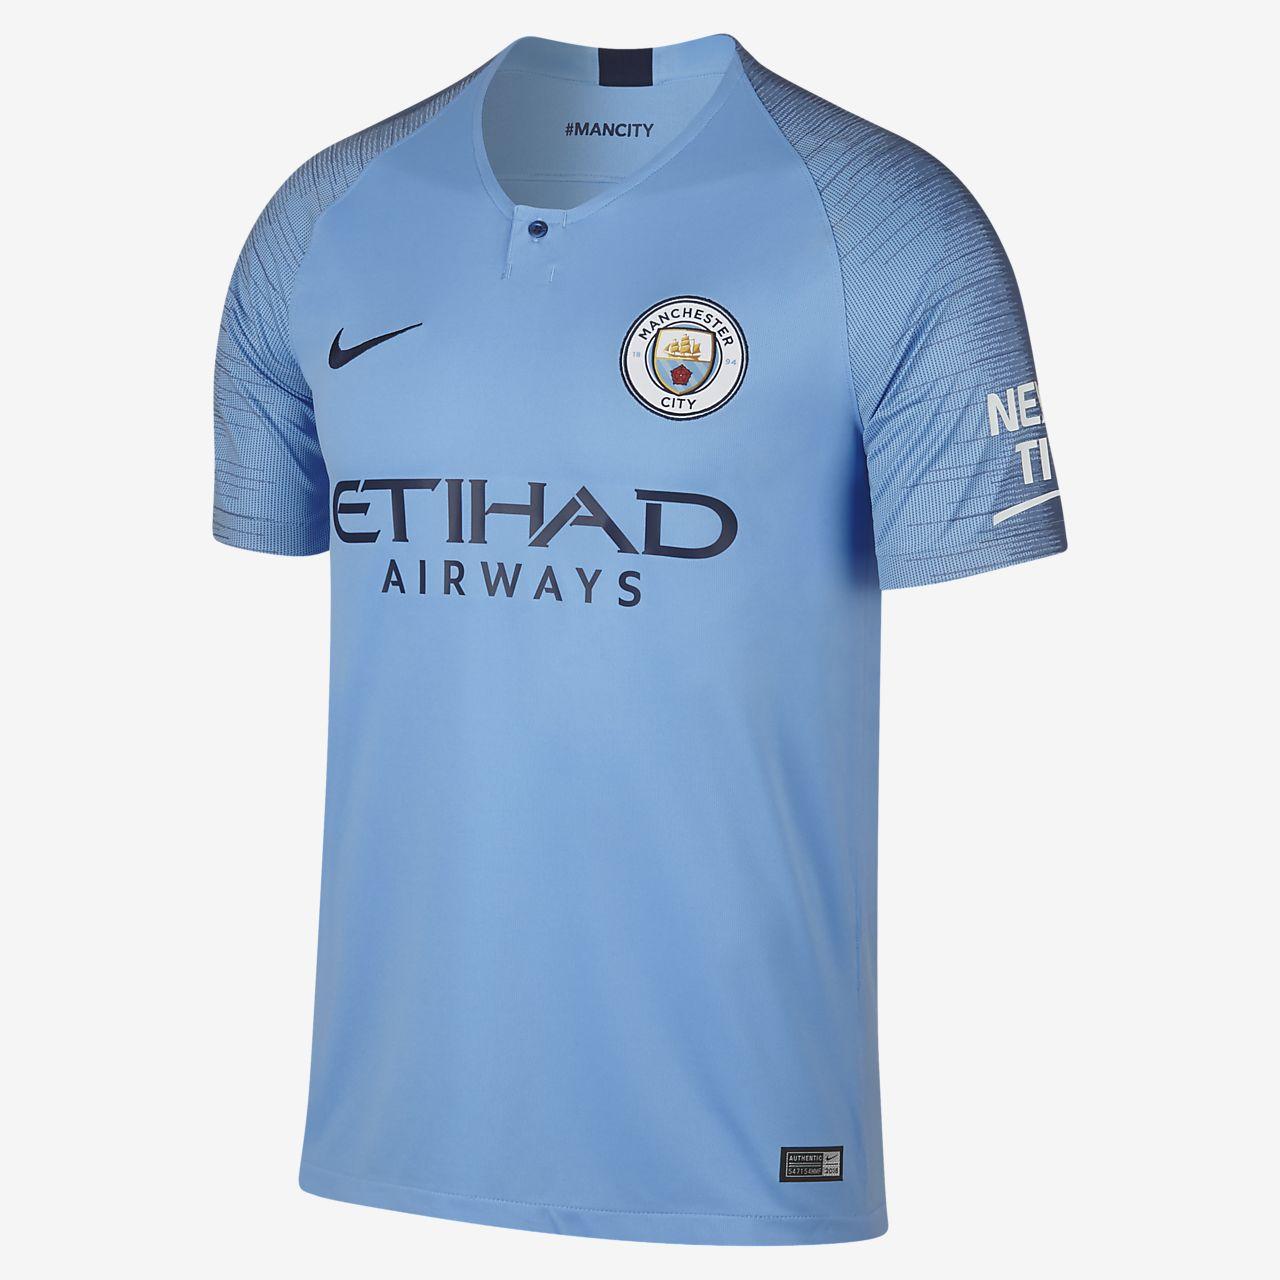 Maillot de football 2018/19 Manchester City FC Stadium Home pour Homme